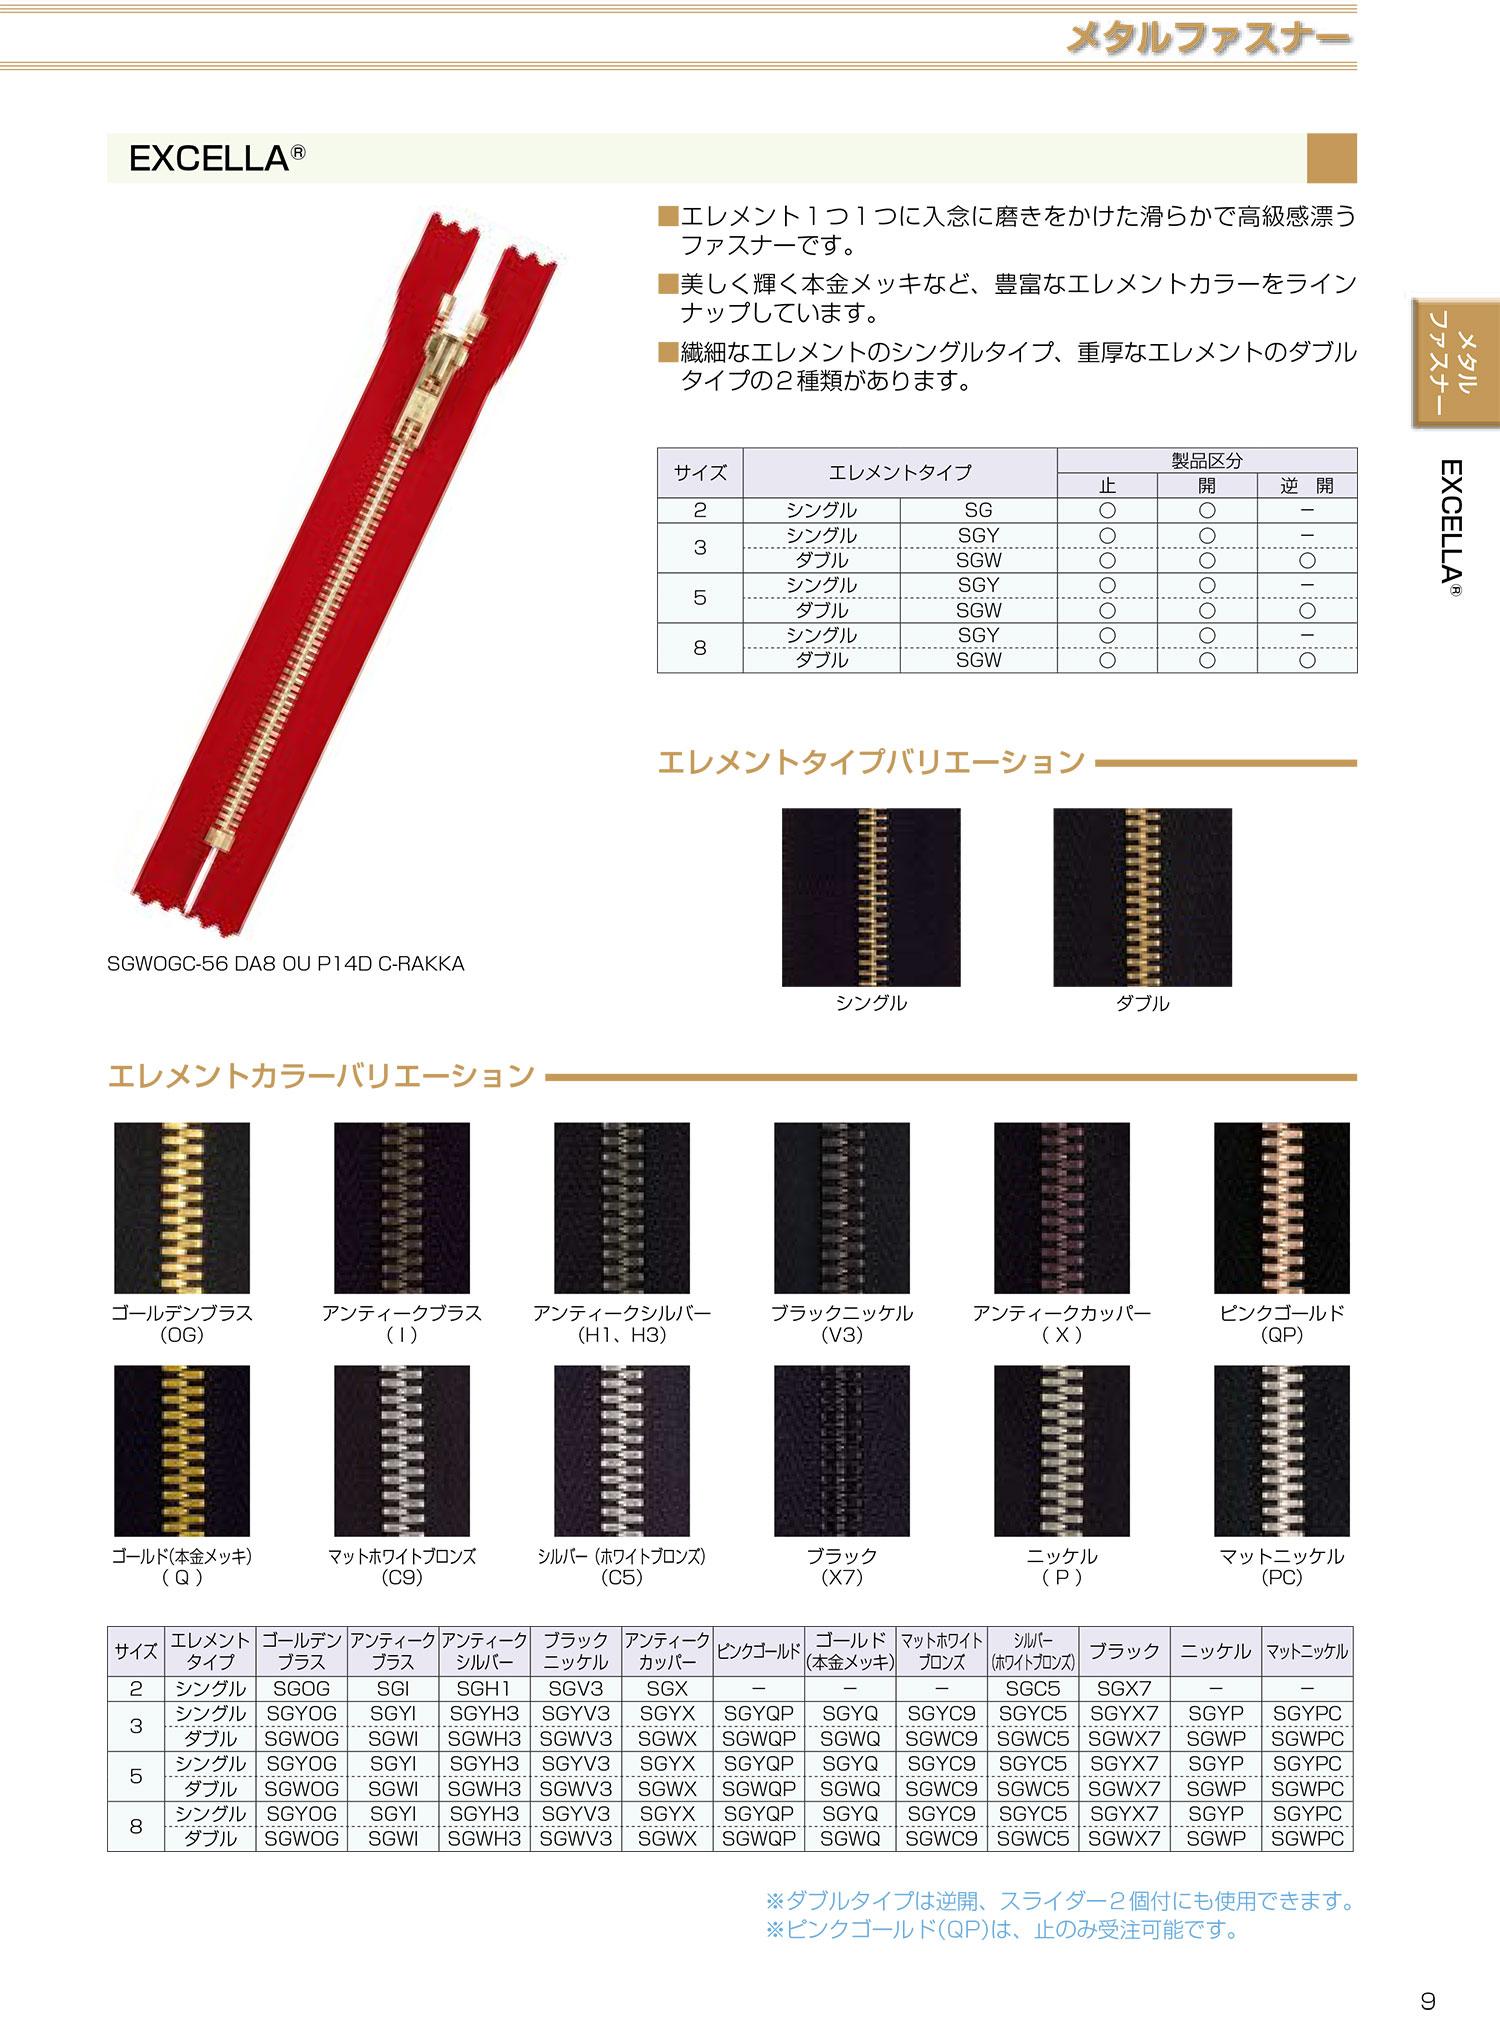 5SGWPOR エクセラ 5サイズ ニッケル オープン ダブル[ファスナー] YKK/オークラ商事 - ApparelX アパレル資材卸通販